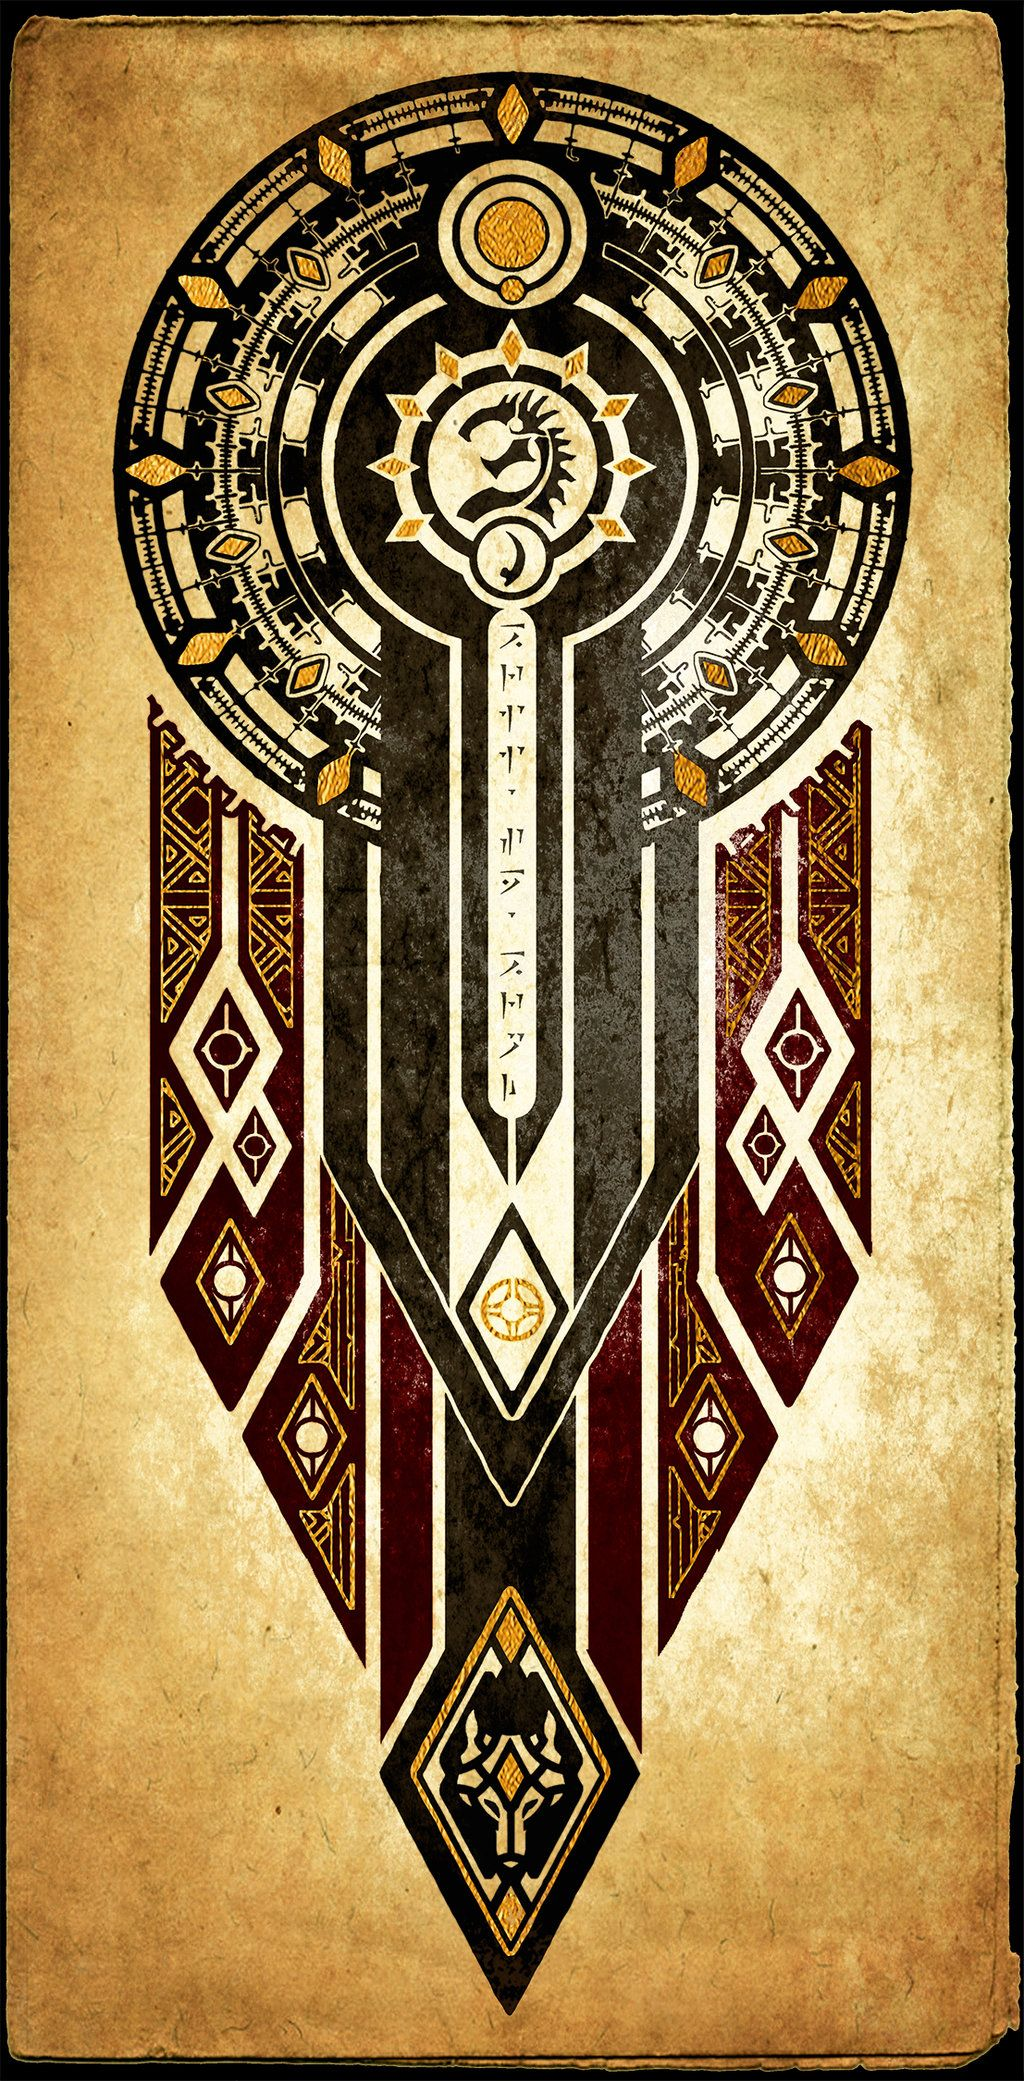 Pin By Shaun Brammer On The Elder Scrolls Pinterest Deviantart